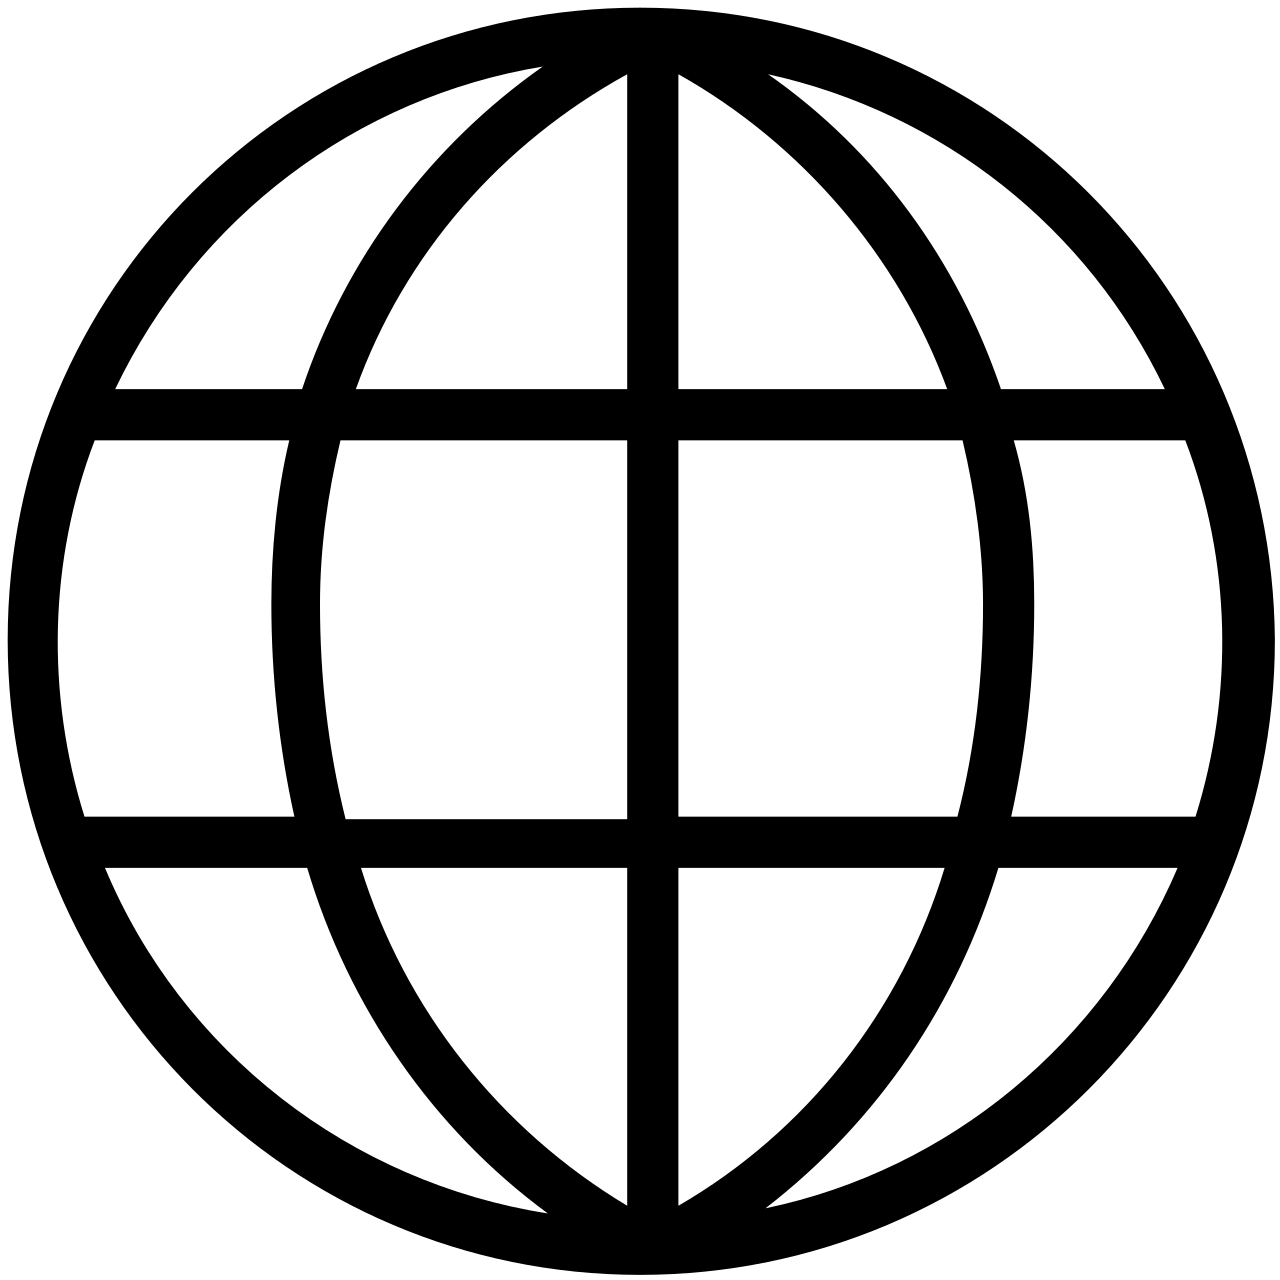 universal-industry-standard-black-50x50